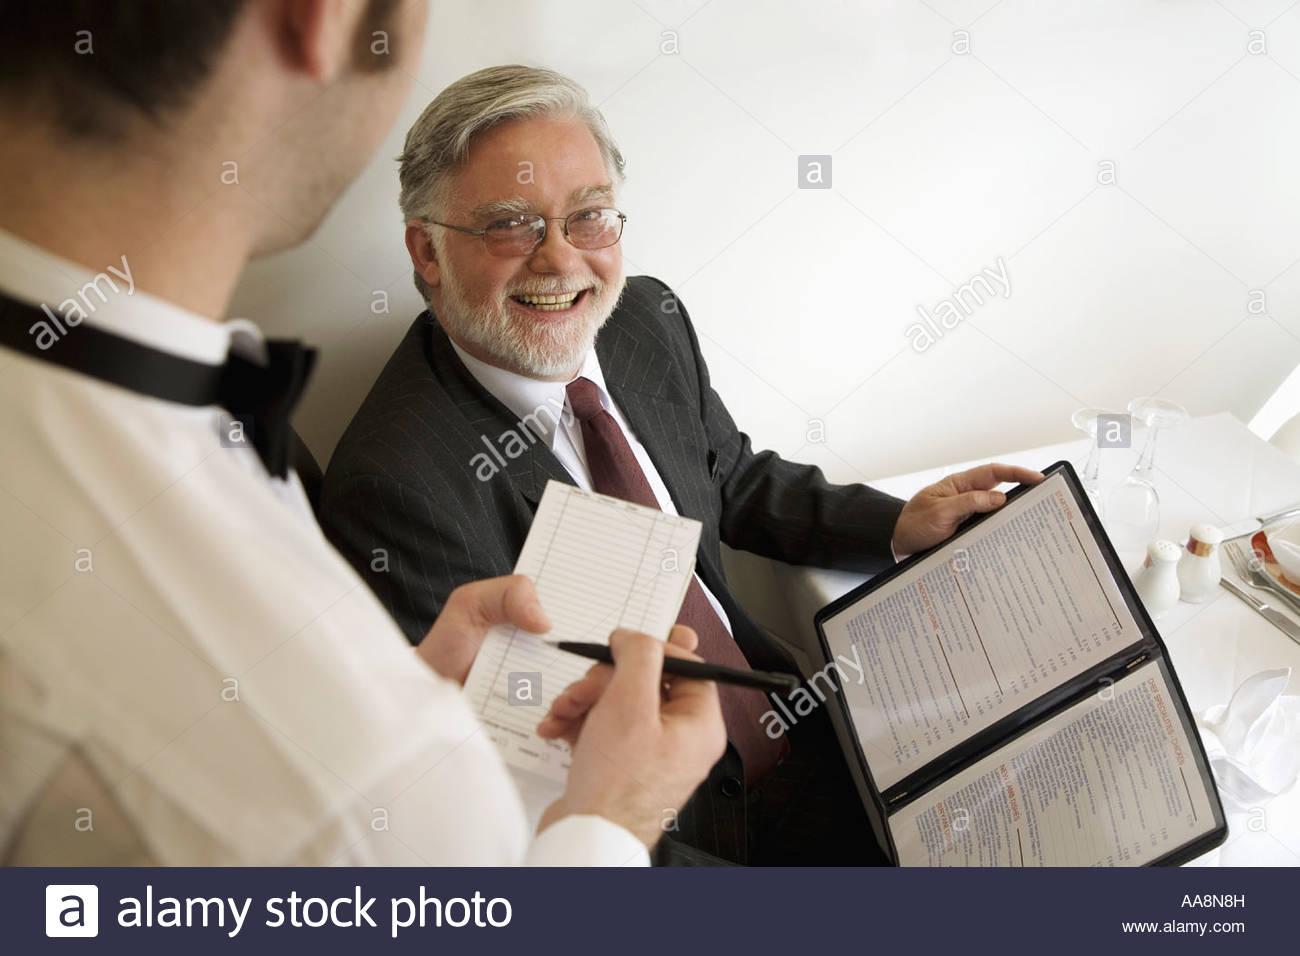 food server taking order from man at restaurant stock photo food server taking order from man at restaurant